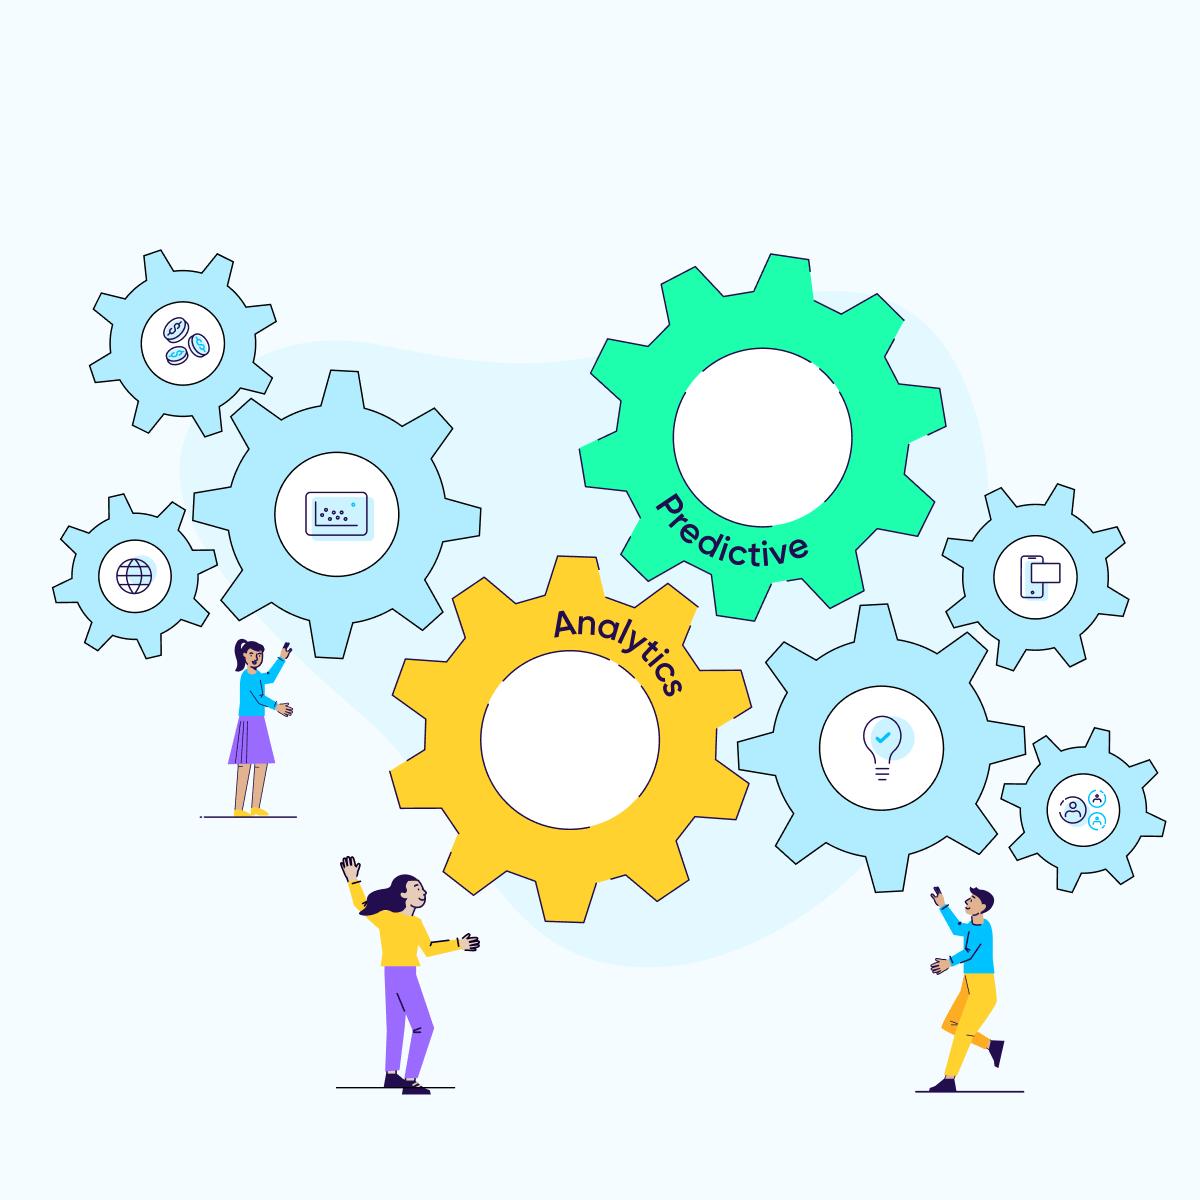 Building AppsFlyer's predictive analytics solution - square